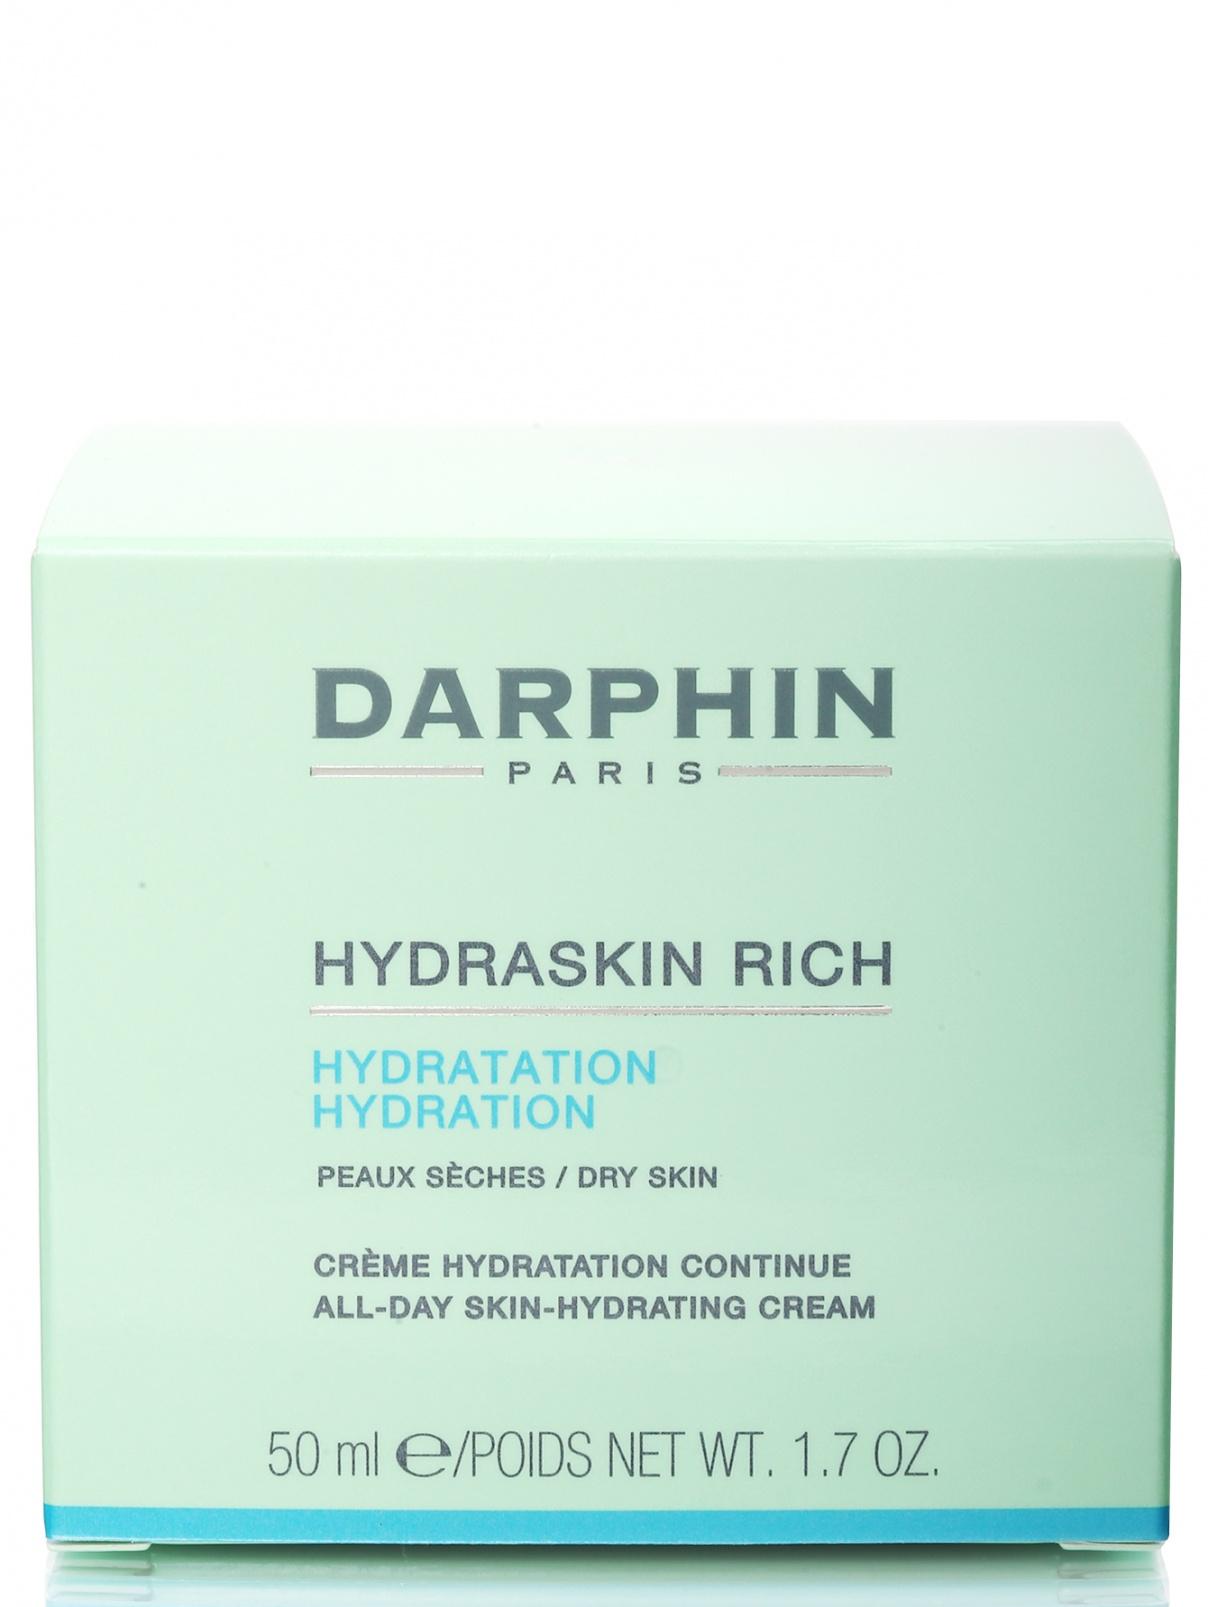 Насыщенный увлажняющий крем - Hydraskin, Face Care, 50ml Darphin  –  Модель Общий вид